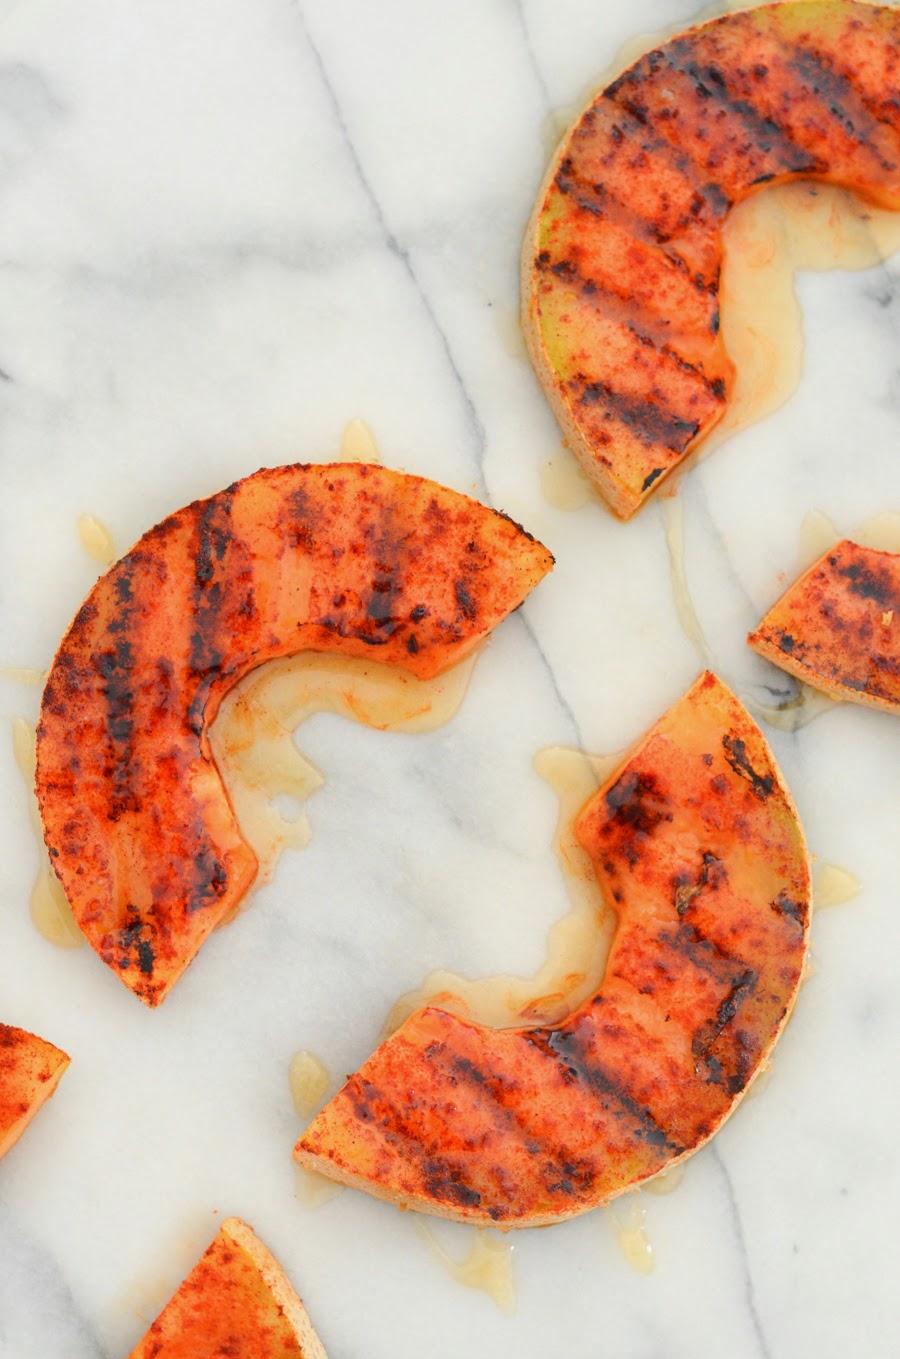 Grilling Cantaloupe